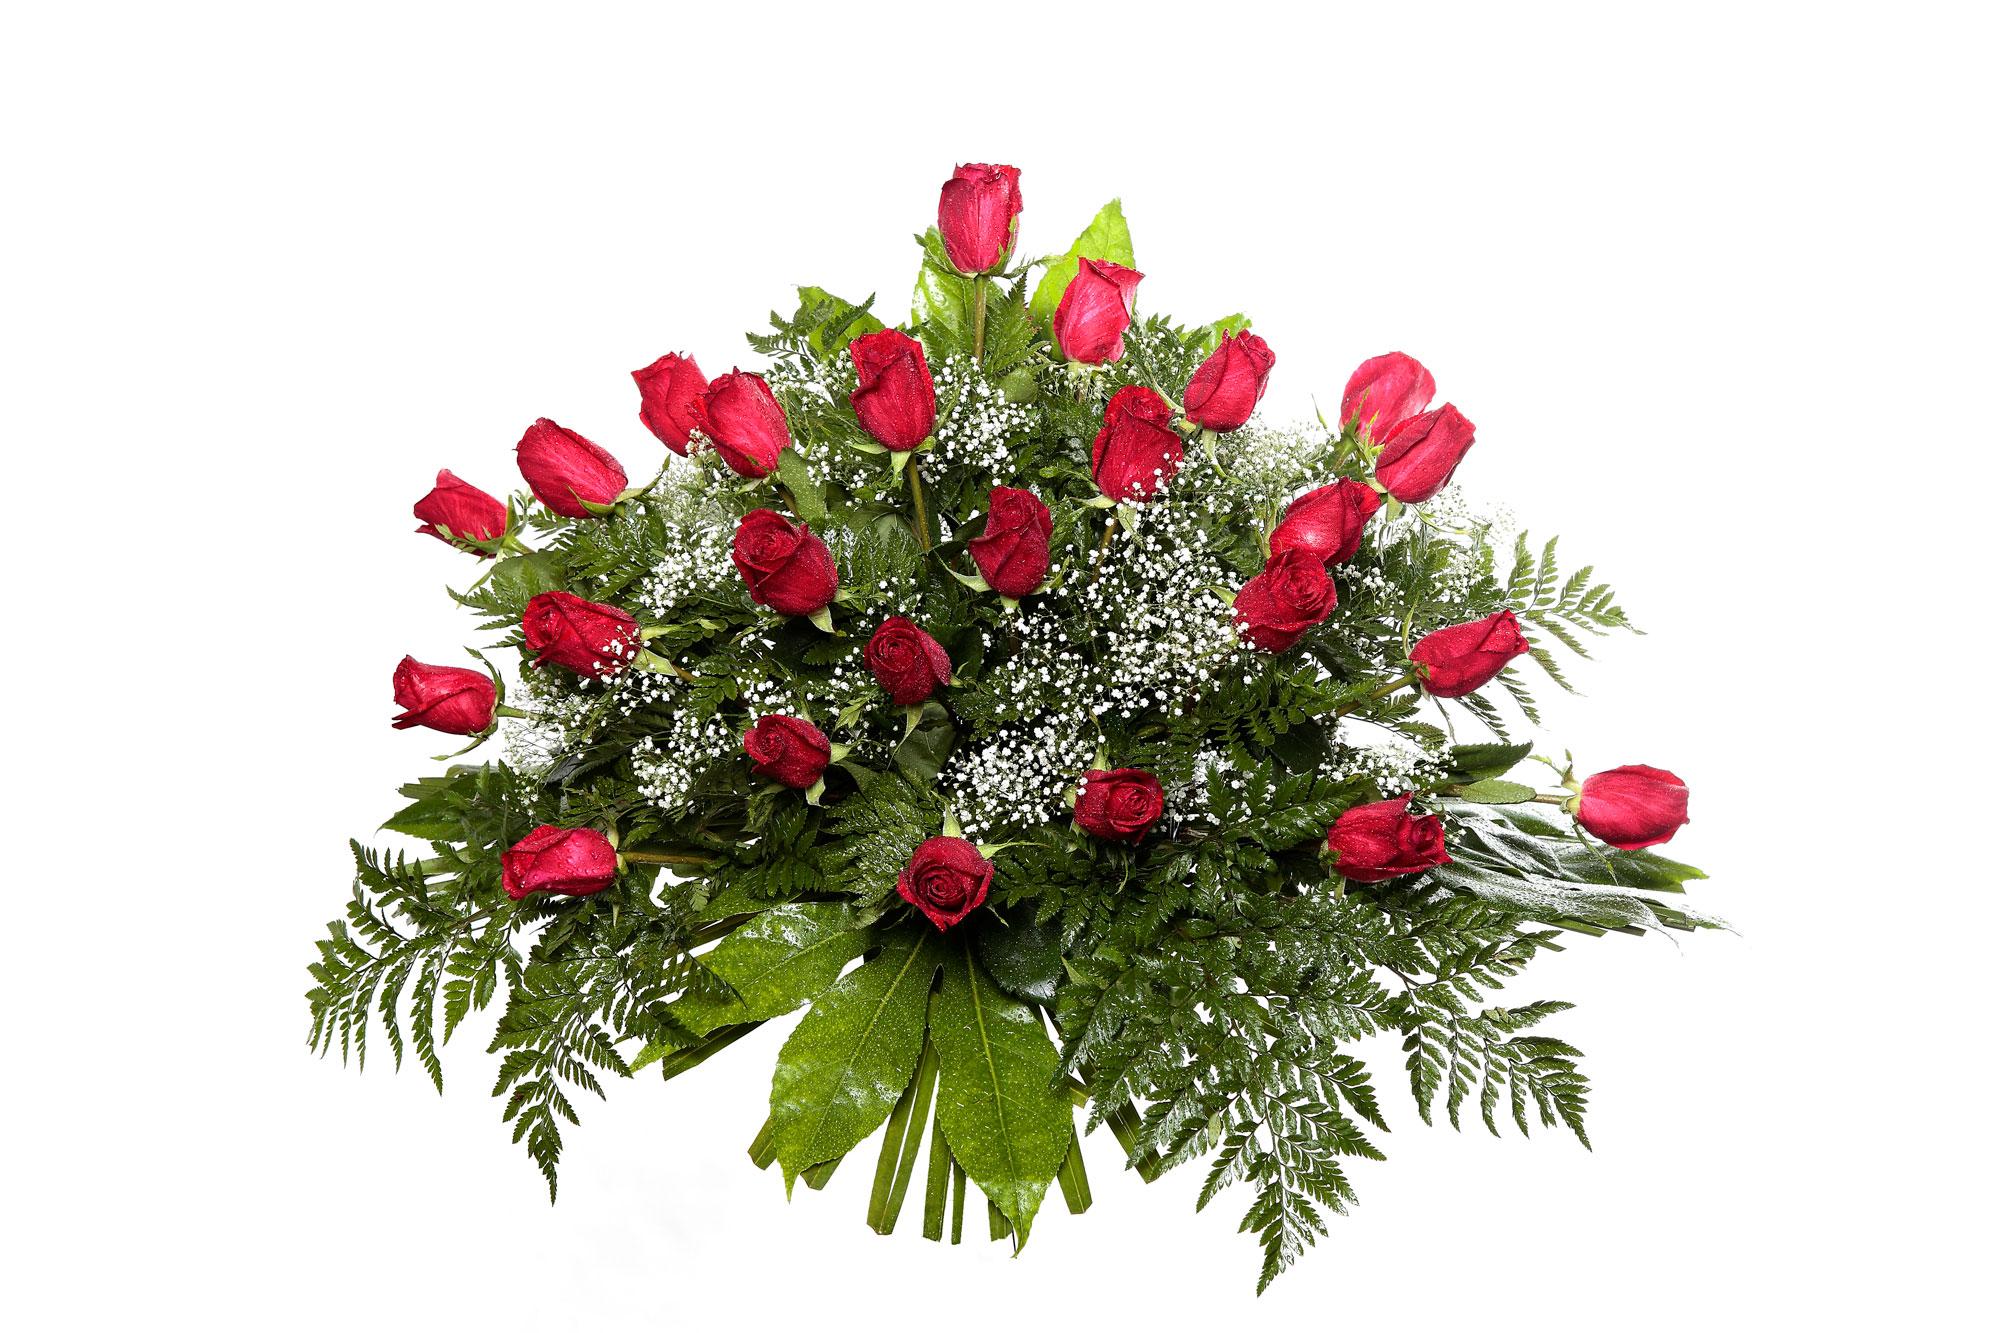 Palma flores tanatorio 8 Q Palmas Flores naturales Tienda